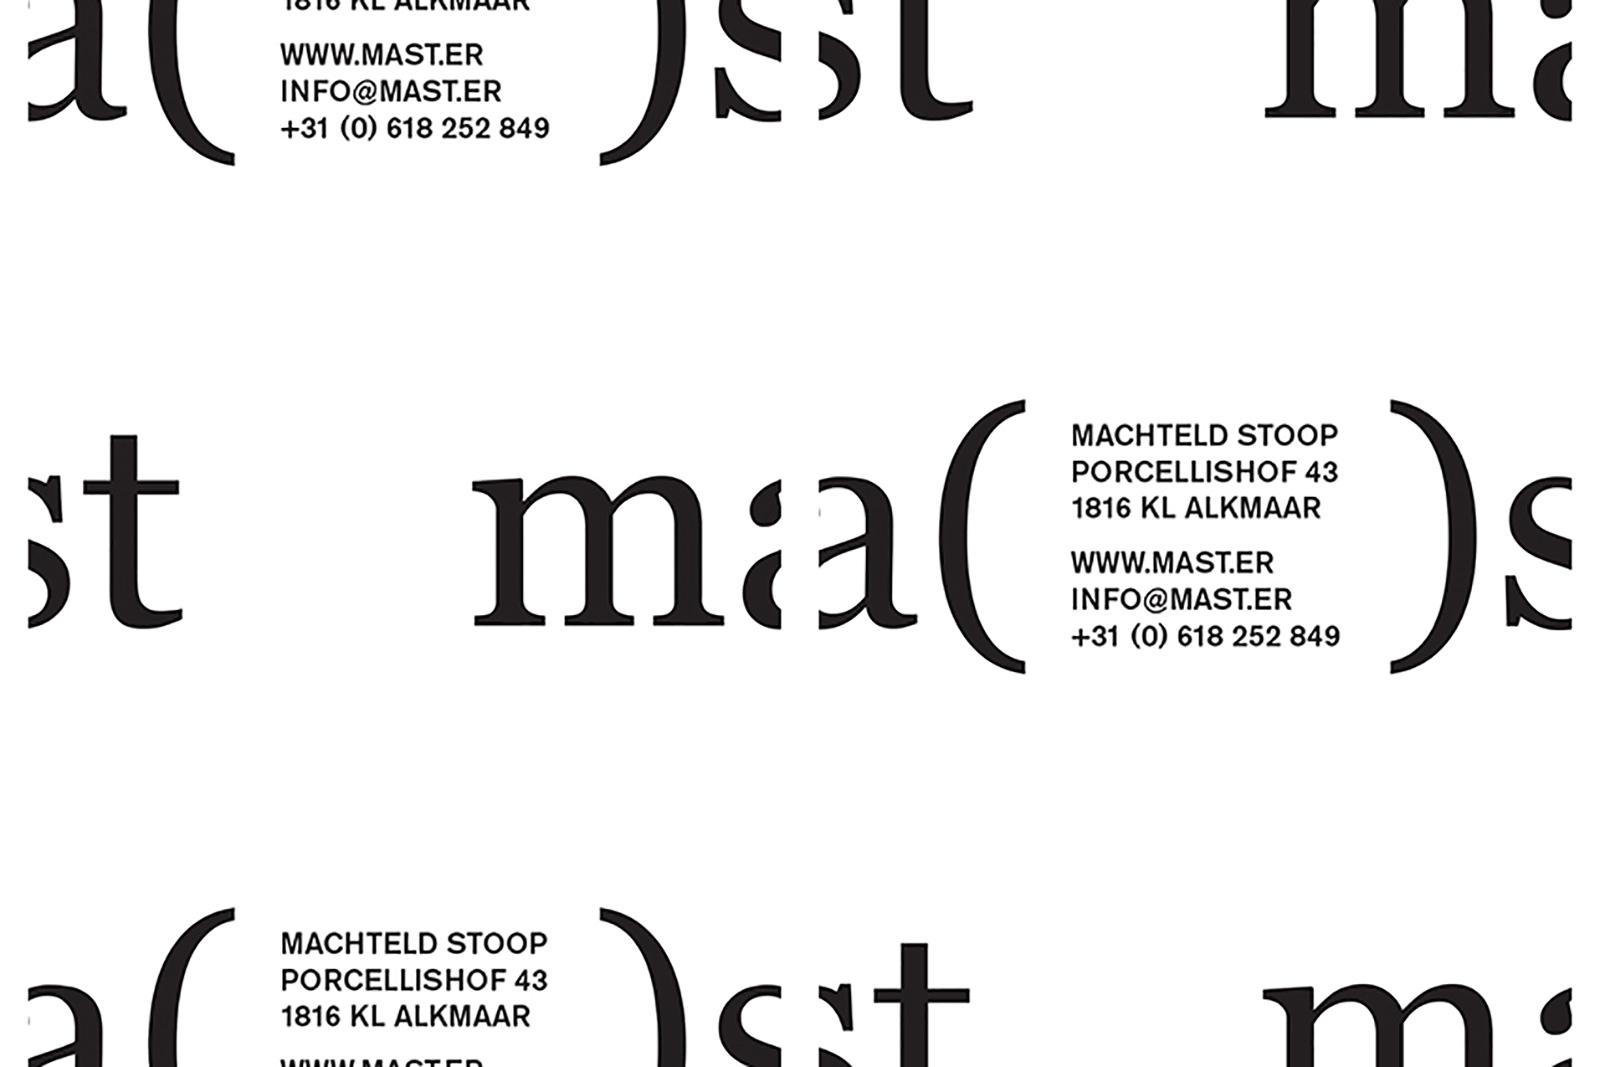 MA_ST_Identity-wilco-monen-04.jpg